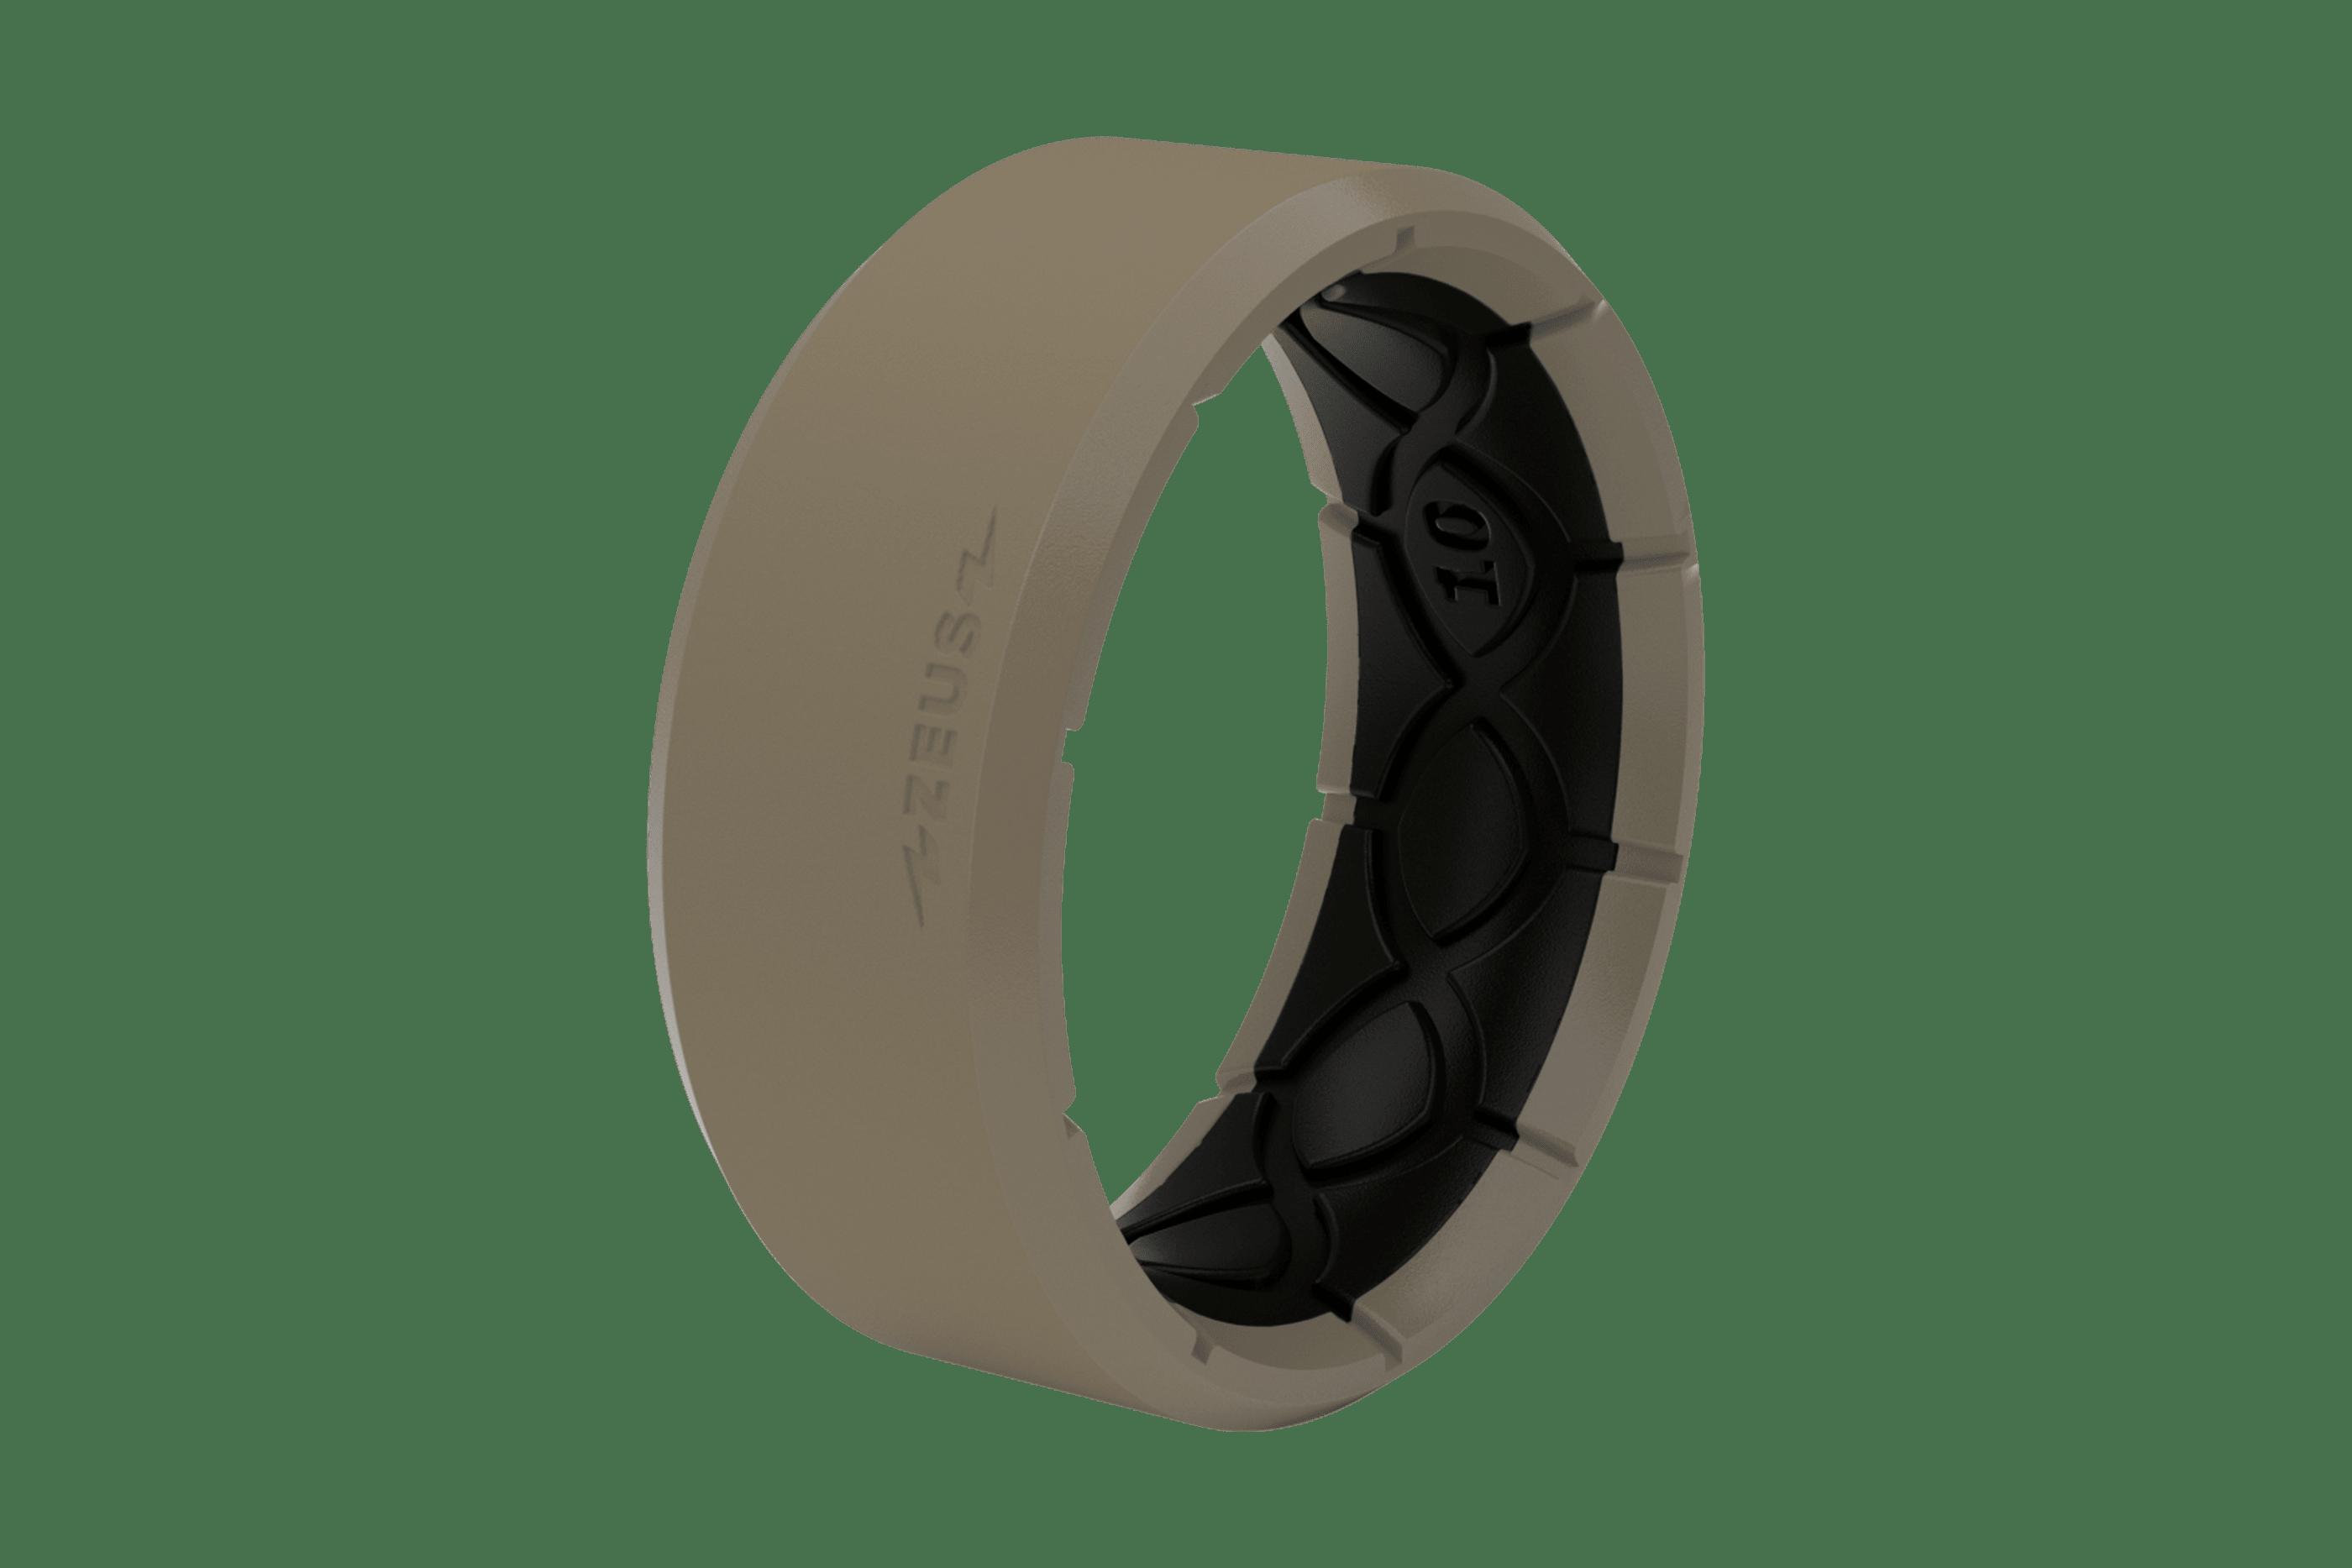 Zeus Edge Flat Earth/Black - Groove Life Silicone Wedding Rings